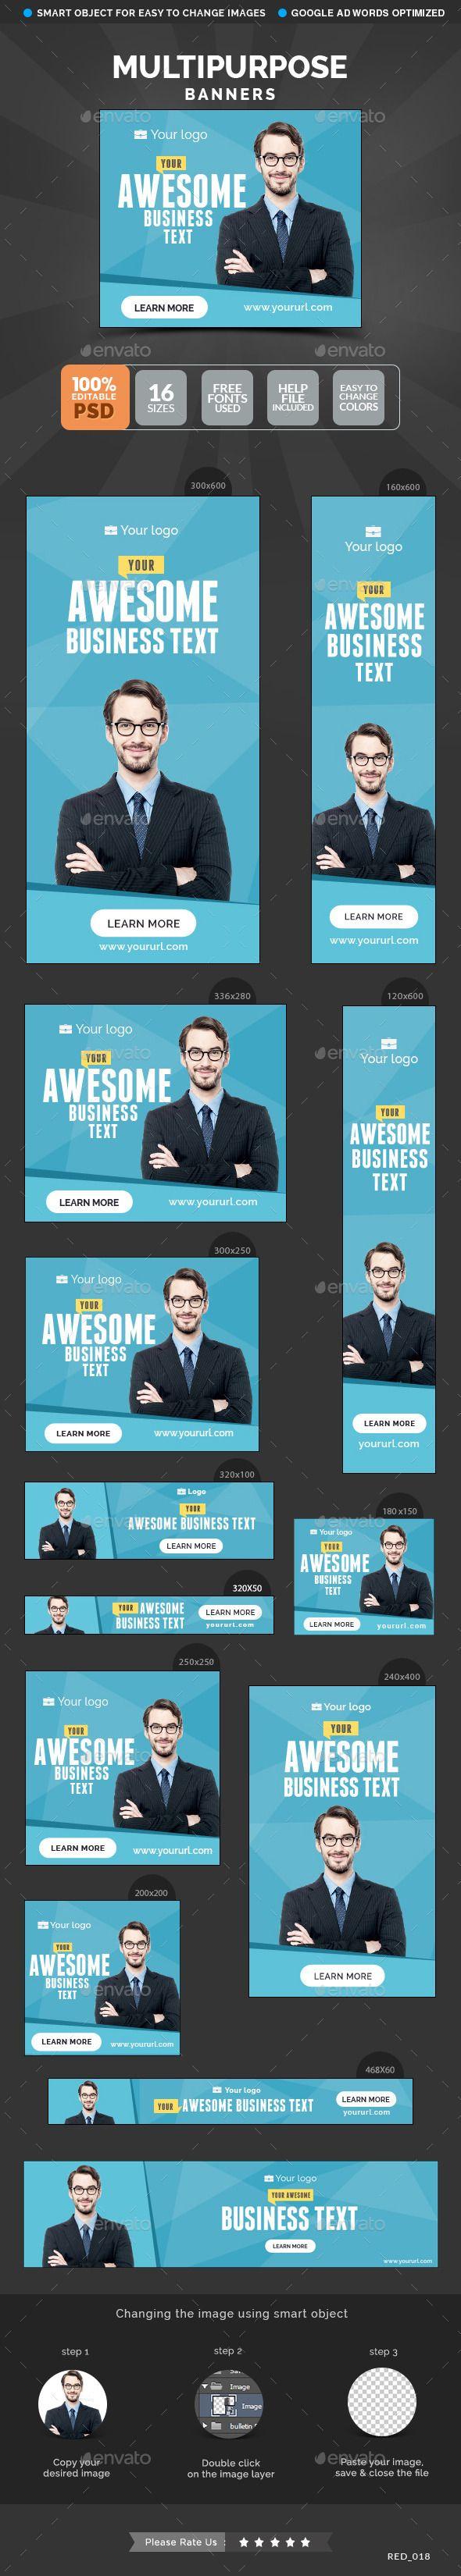 Multipurpose Banners Template PSD #banner #webbanner #design Download: http://graphicriver.net/item/multipurpose-banners/10654611?ref=ksioks